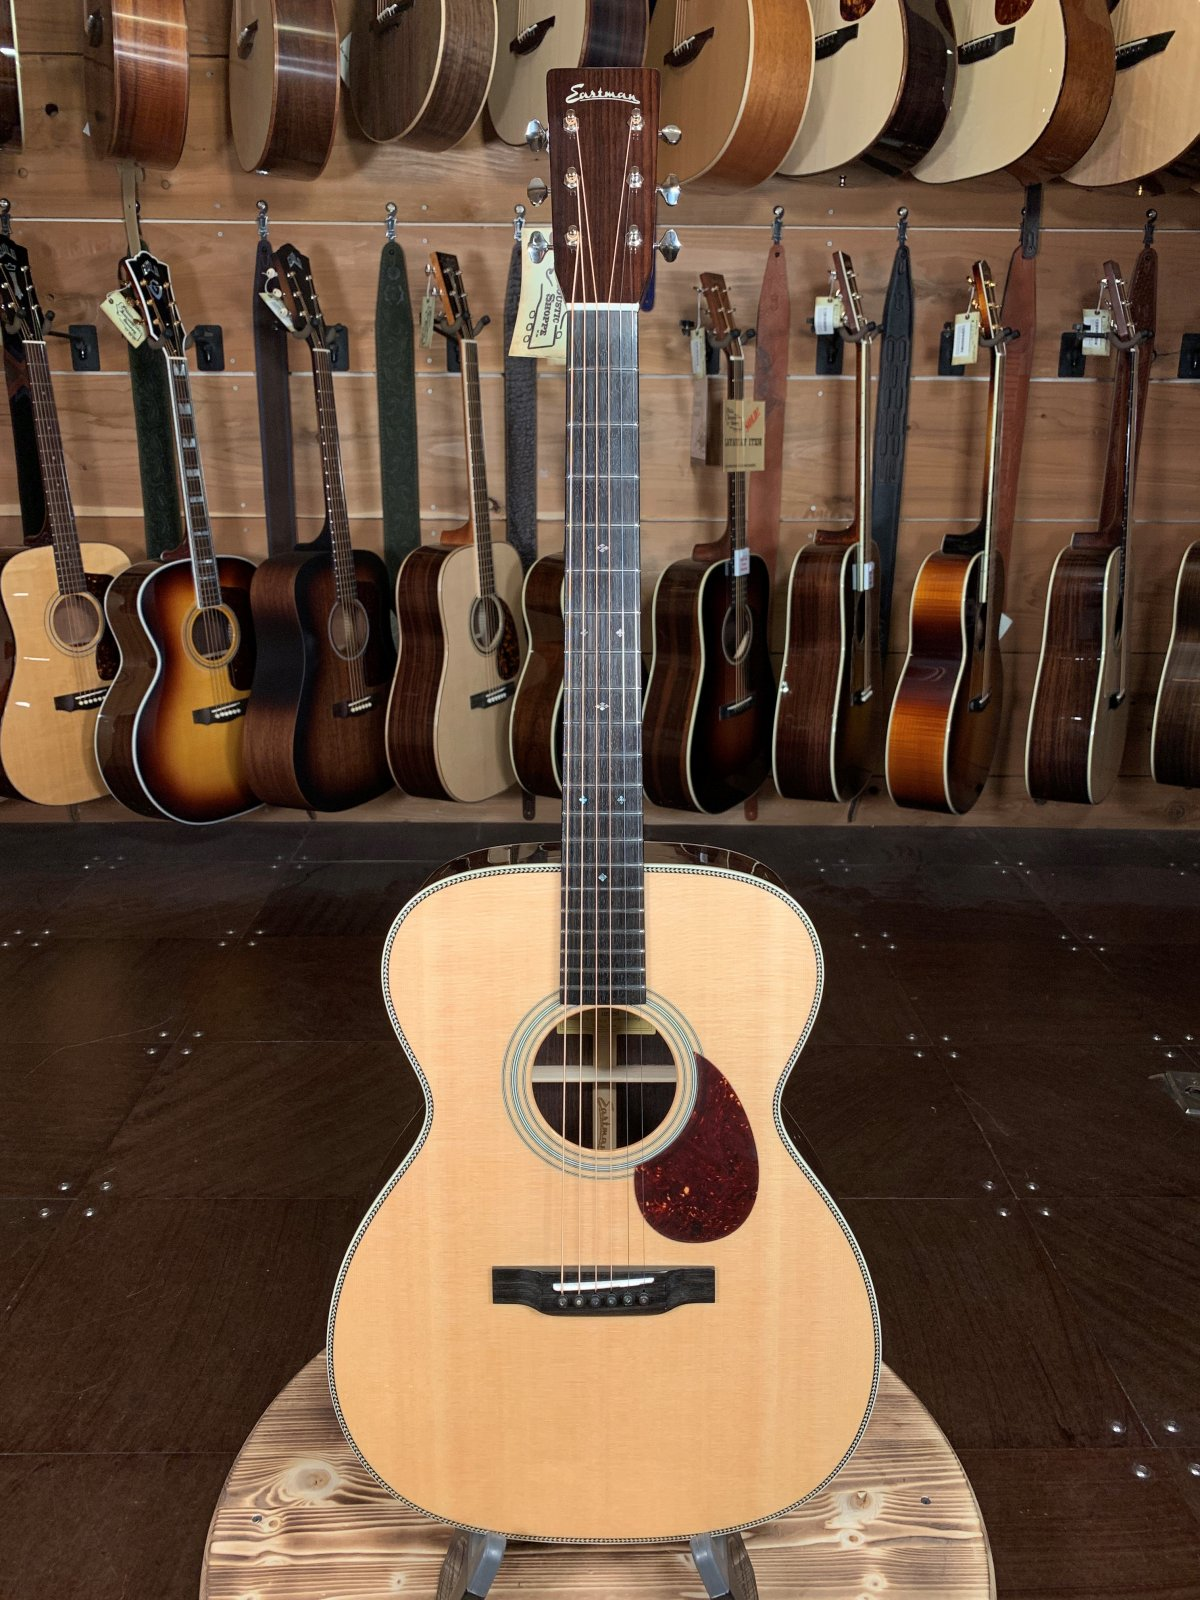 Eastman E8OM Sitka/Rosewood Orchestra Model Guitar #5065